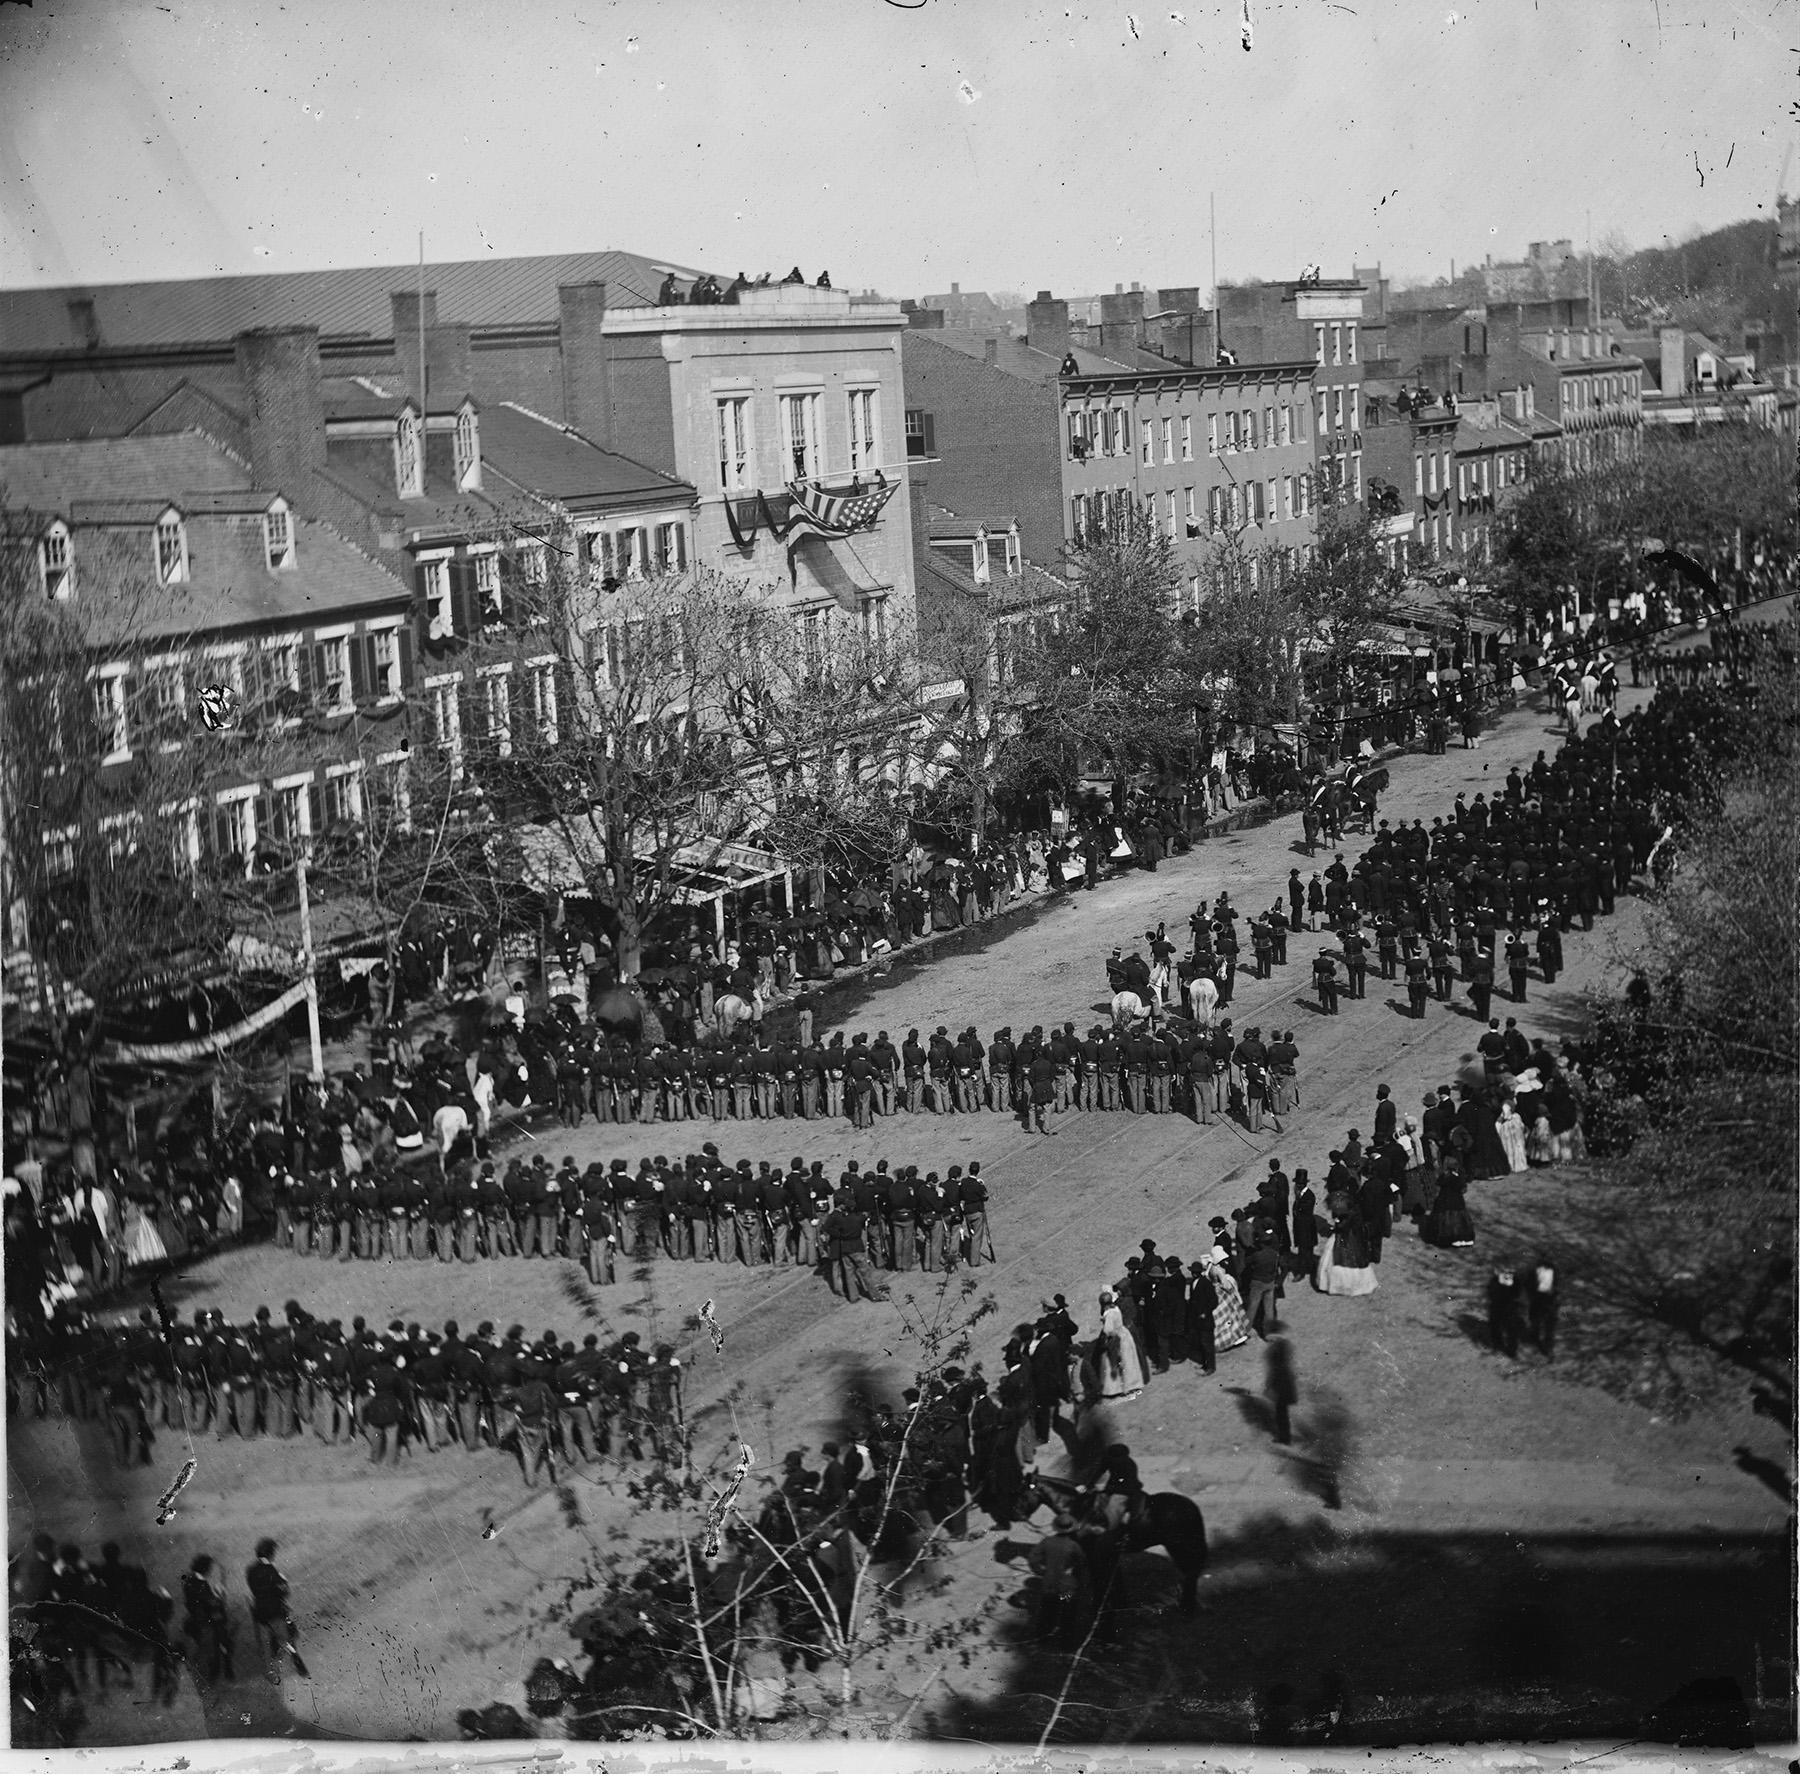 Lincoln's Funeral Procession